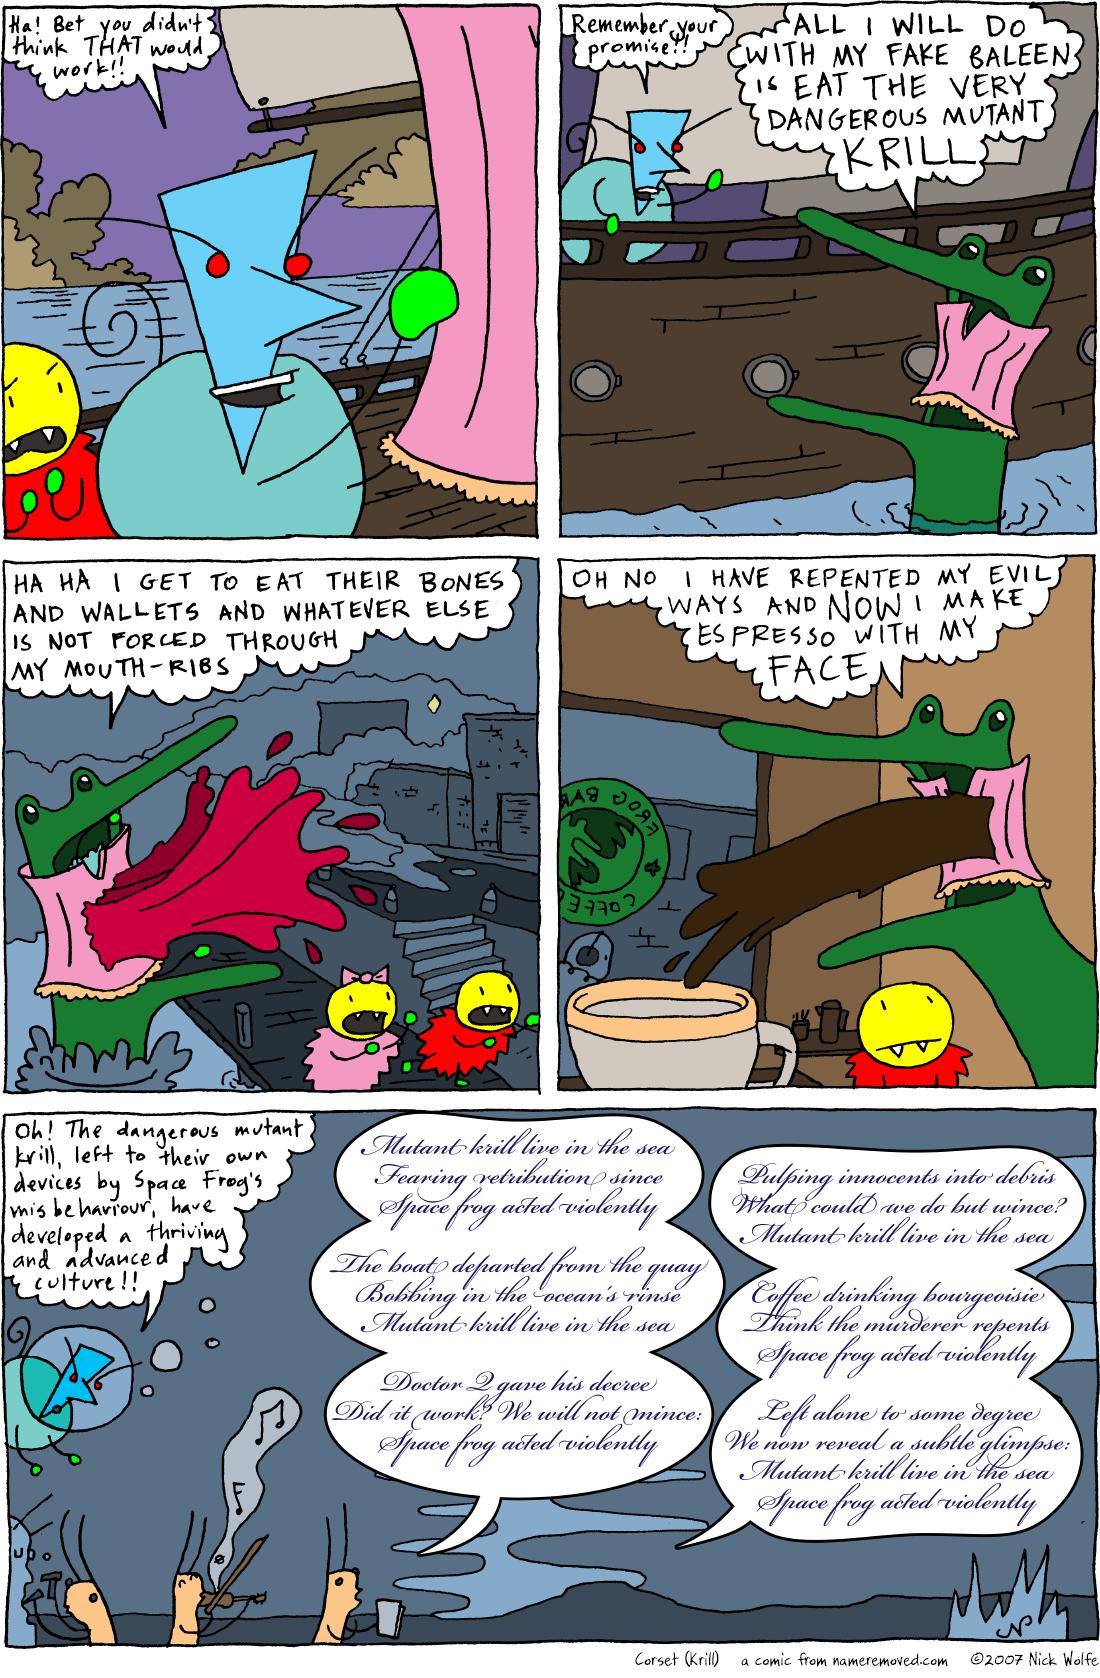 Corset (Krill)